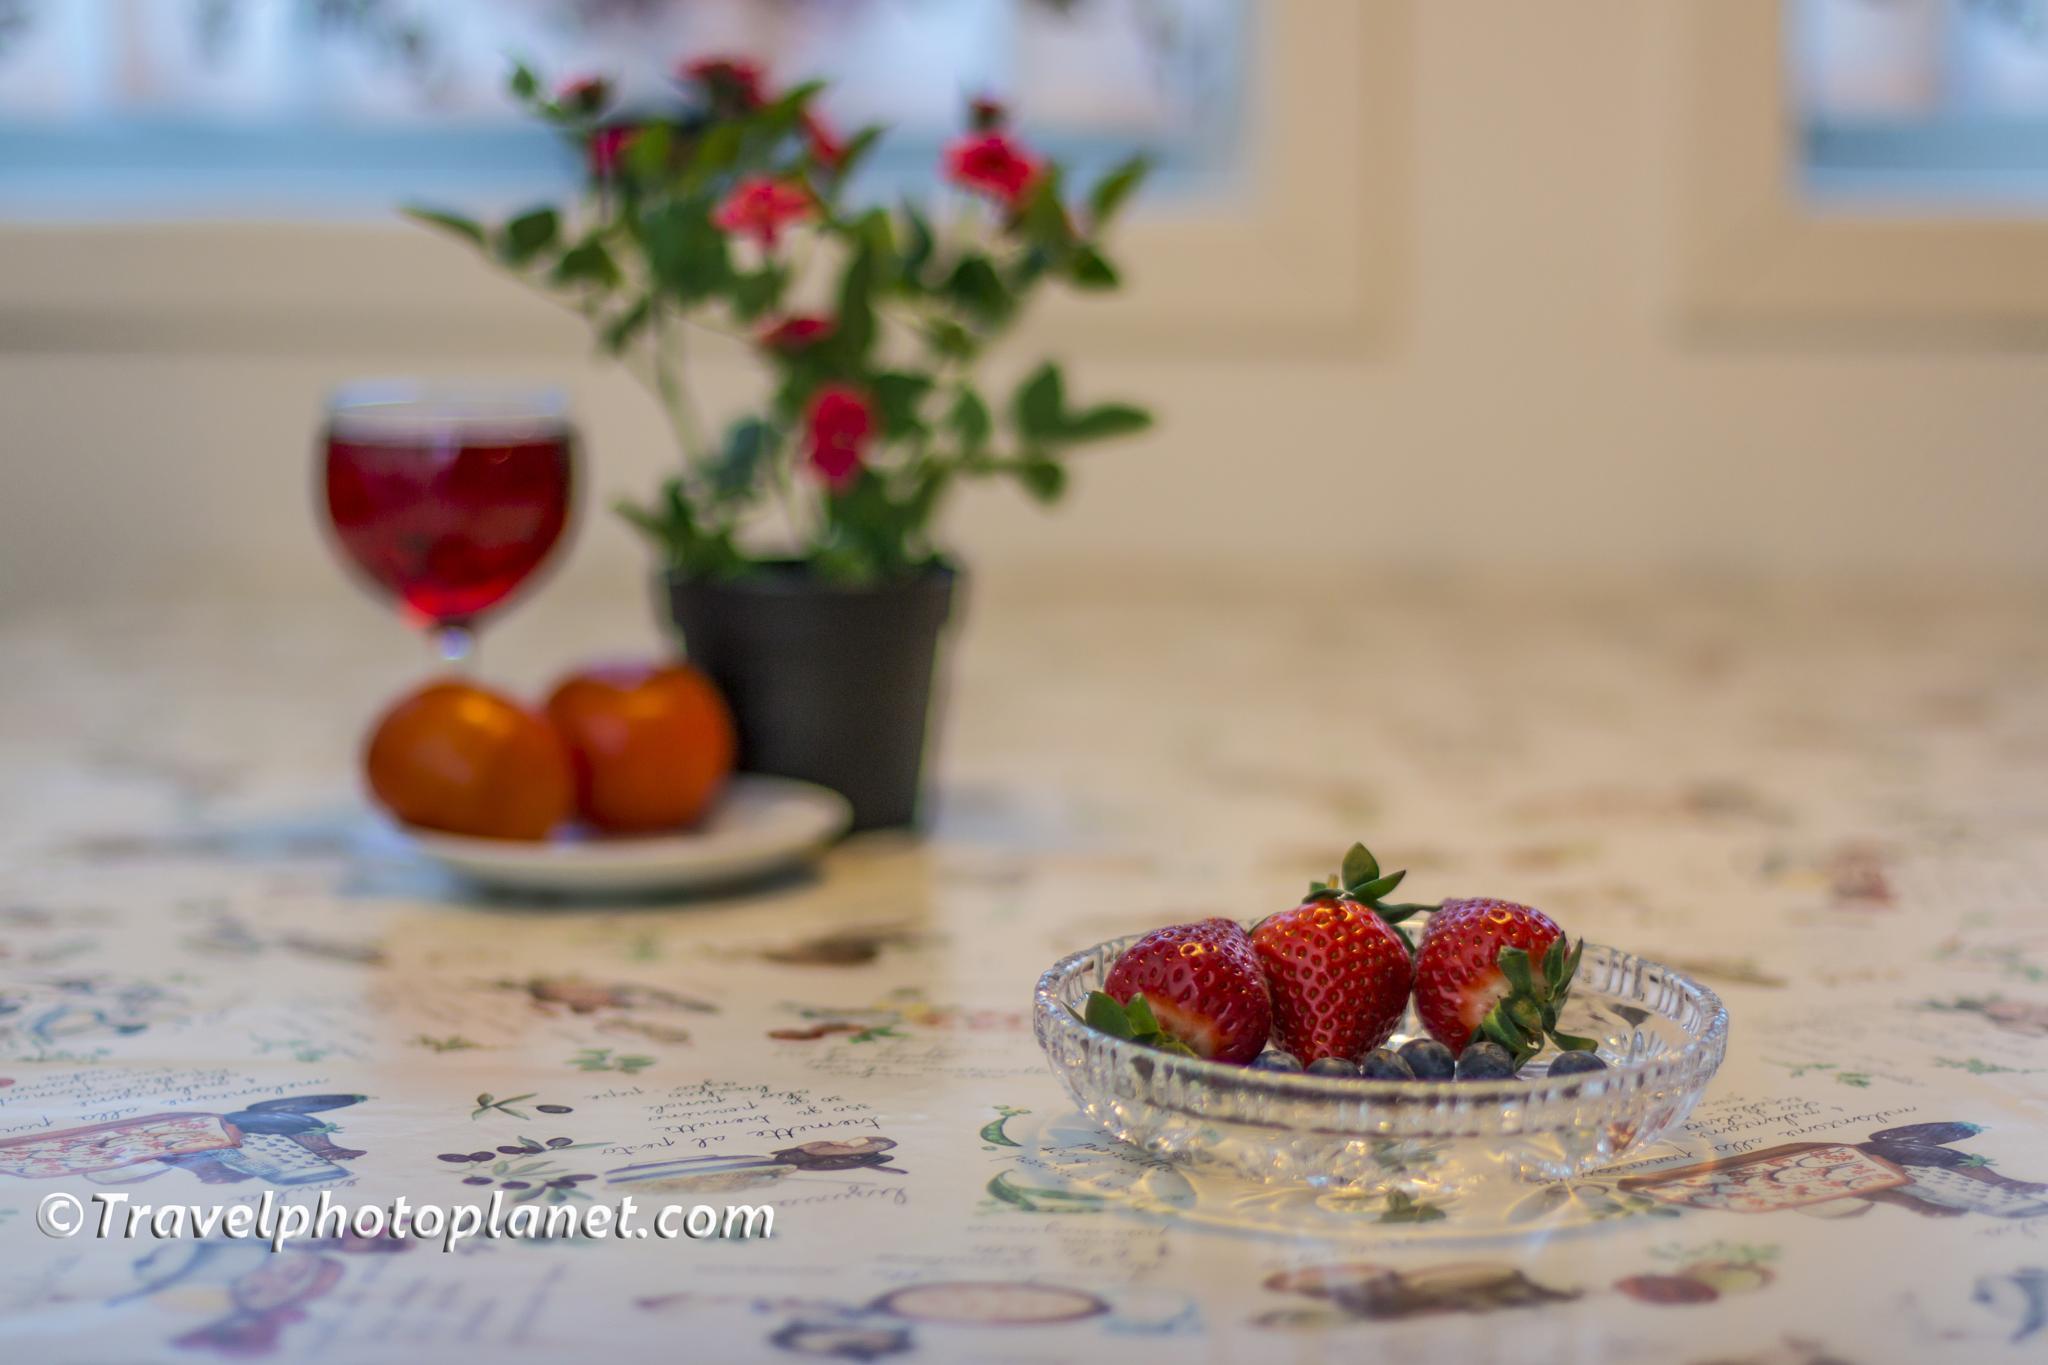 Berry Dessert by Svein Arne Grønnevik